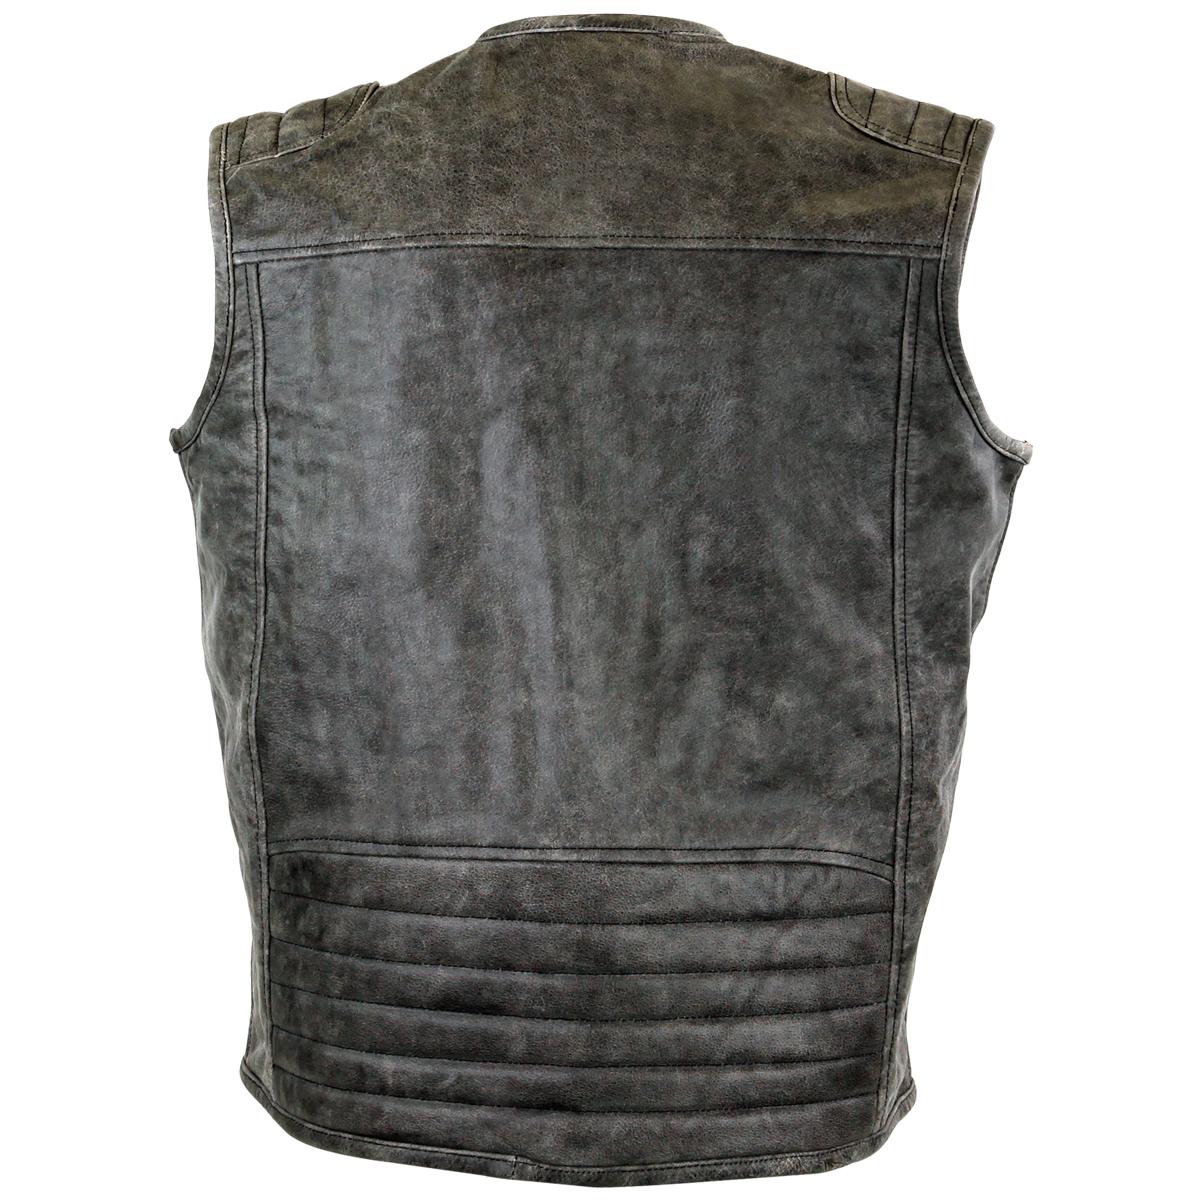 distressed grey motorcycle club leather vest ... npyxnkl